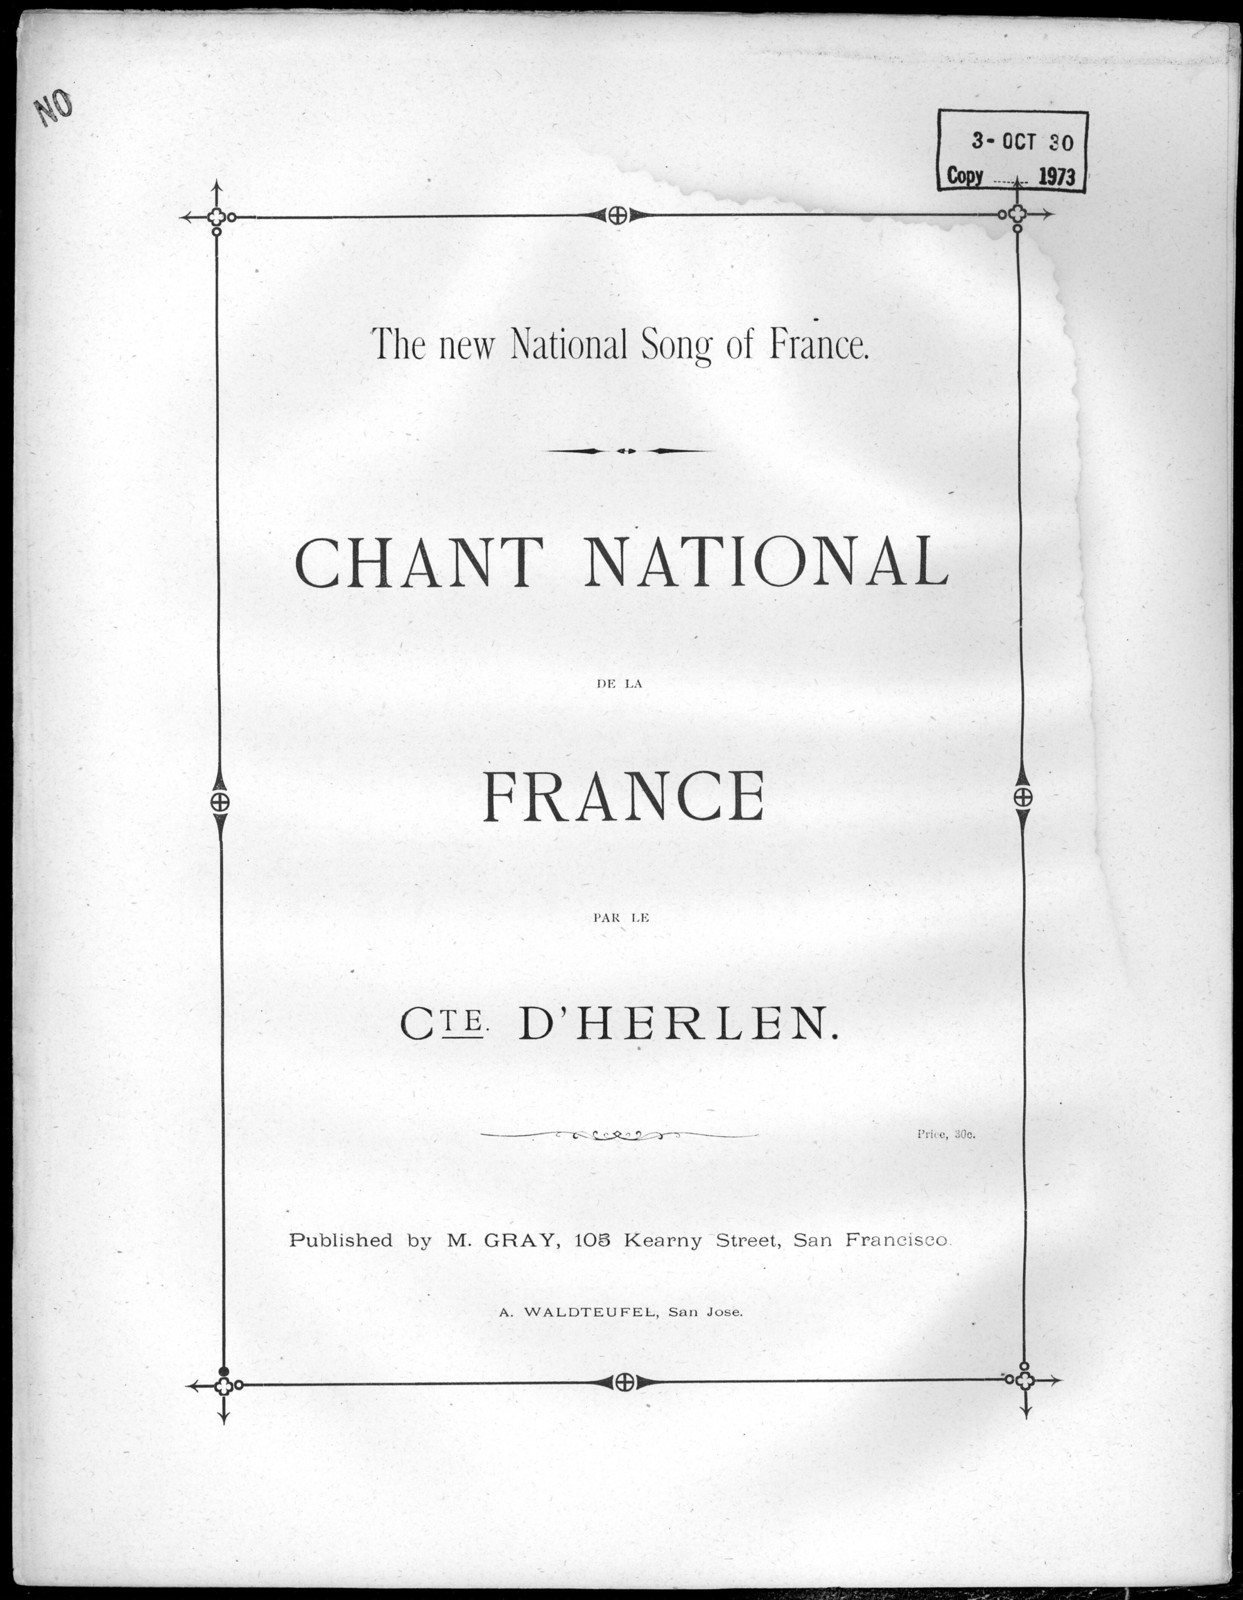 Chant national de la France